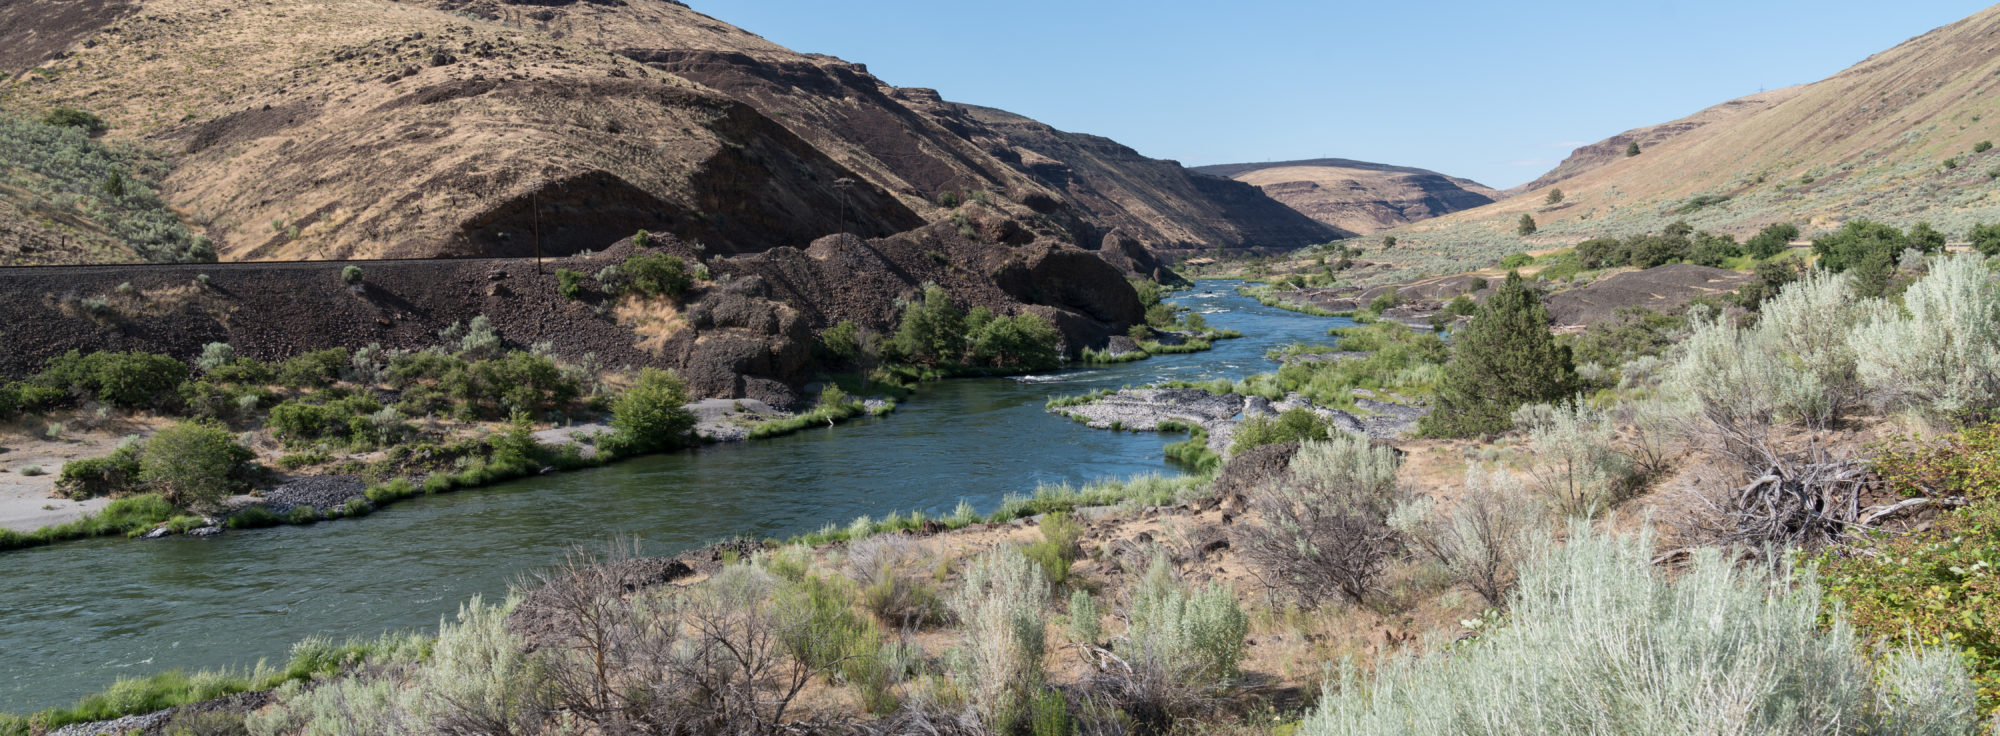 Deschutes River in Maupin